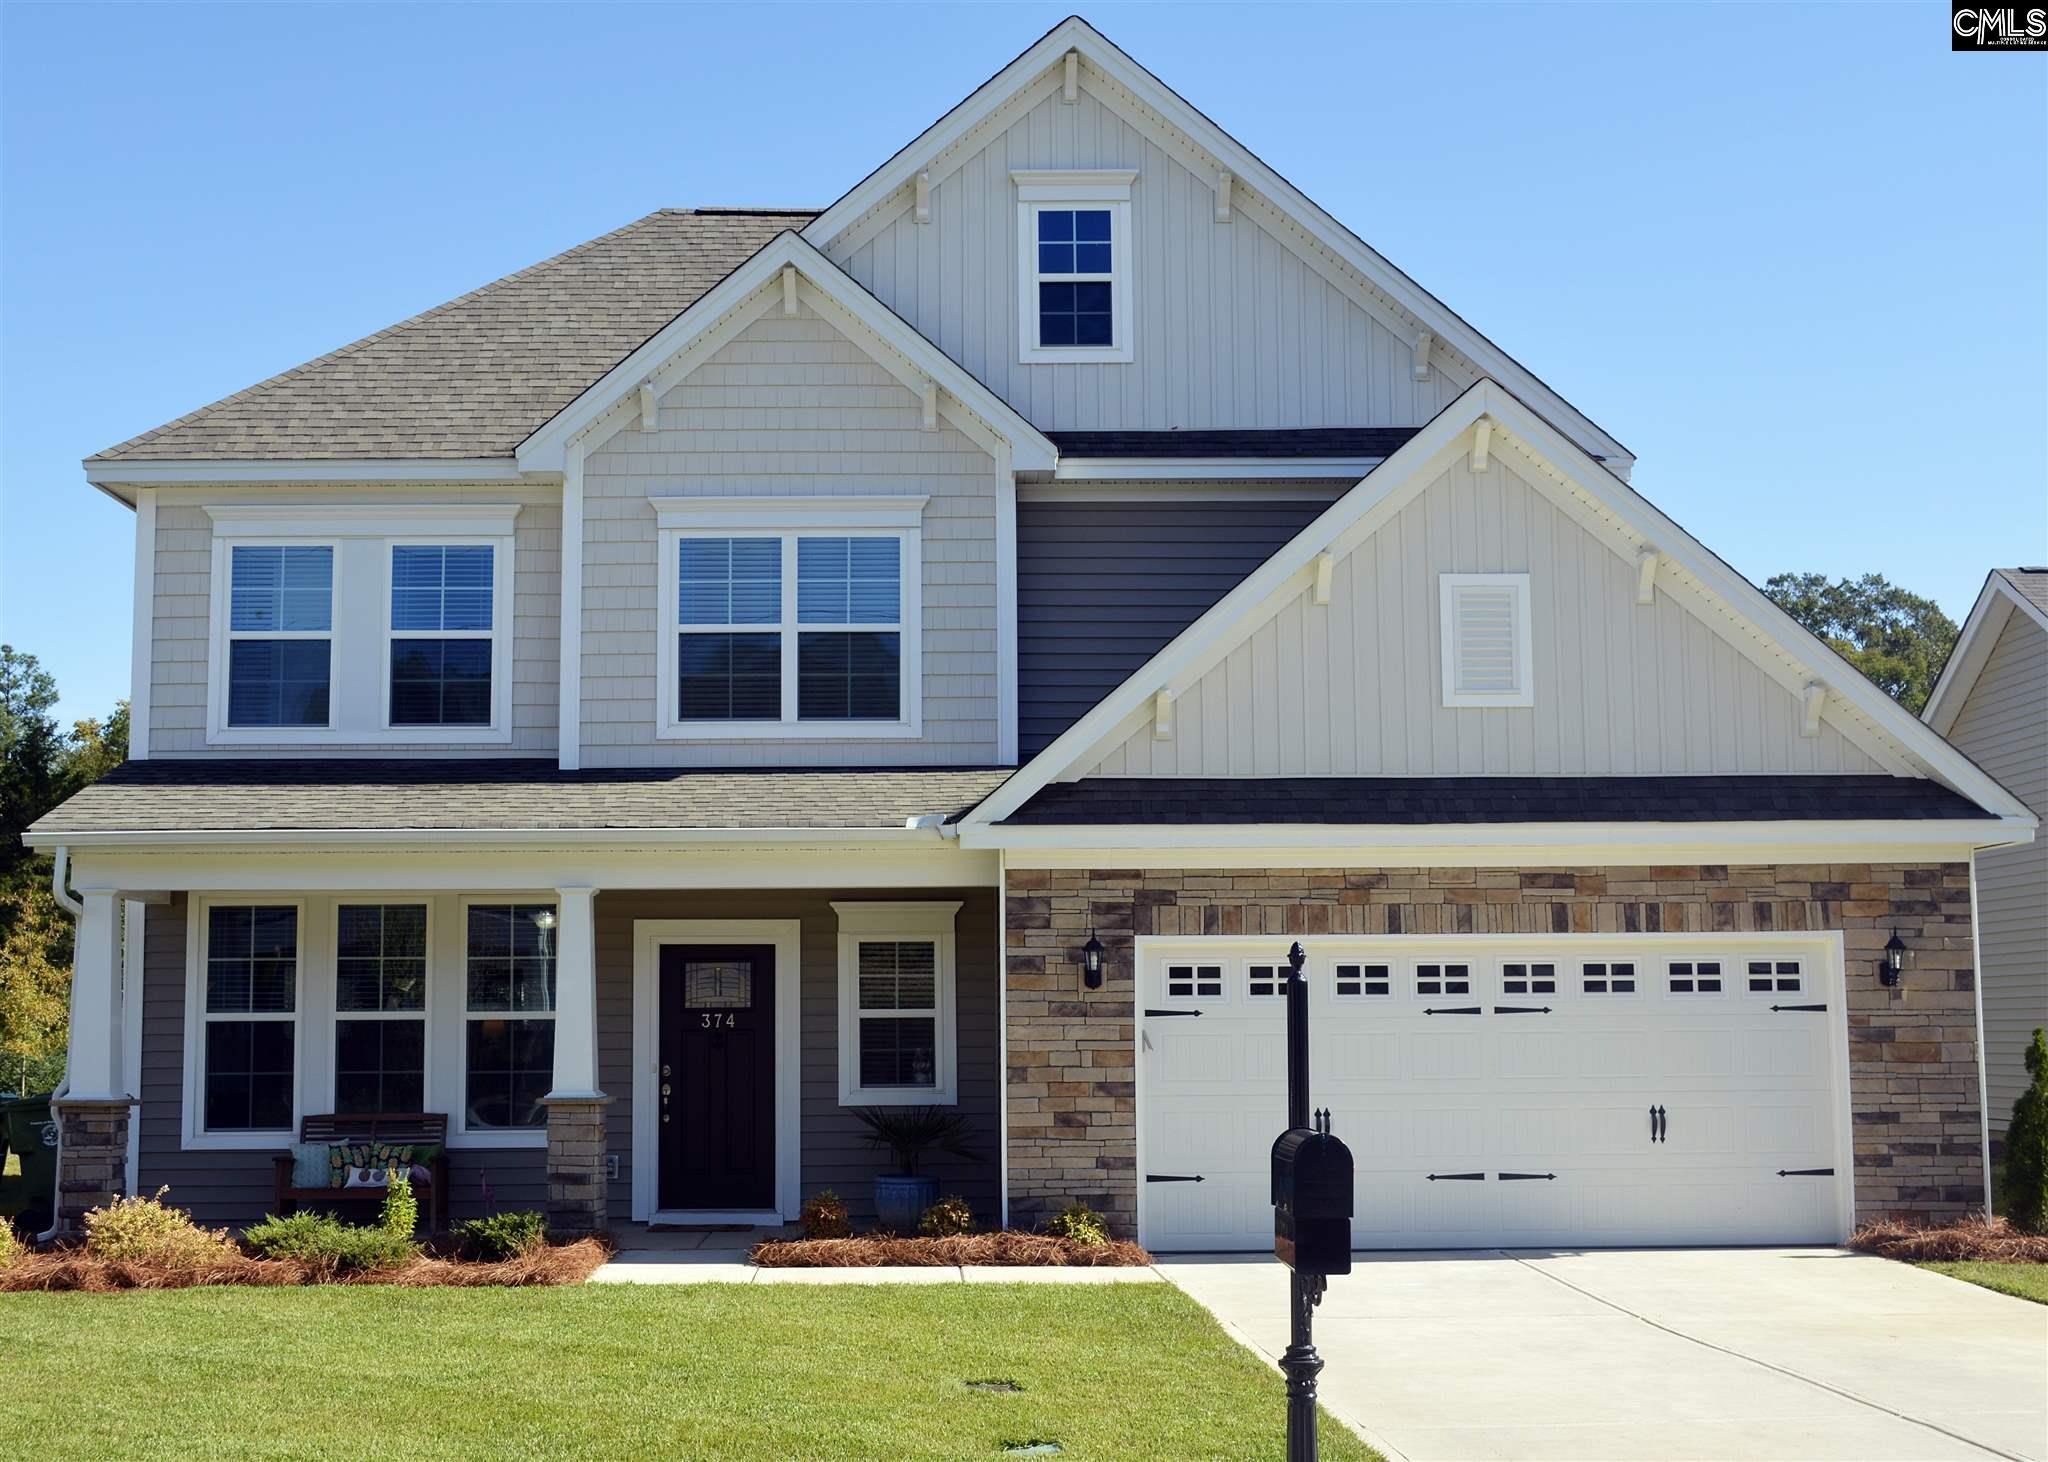 Westcott Ridge Neighborhood Homes For Sale In Chapin SC